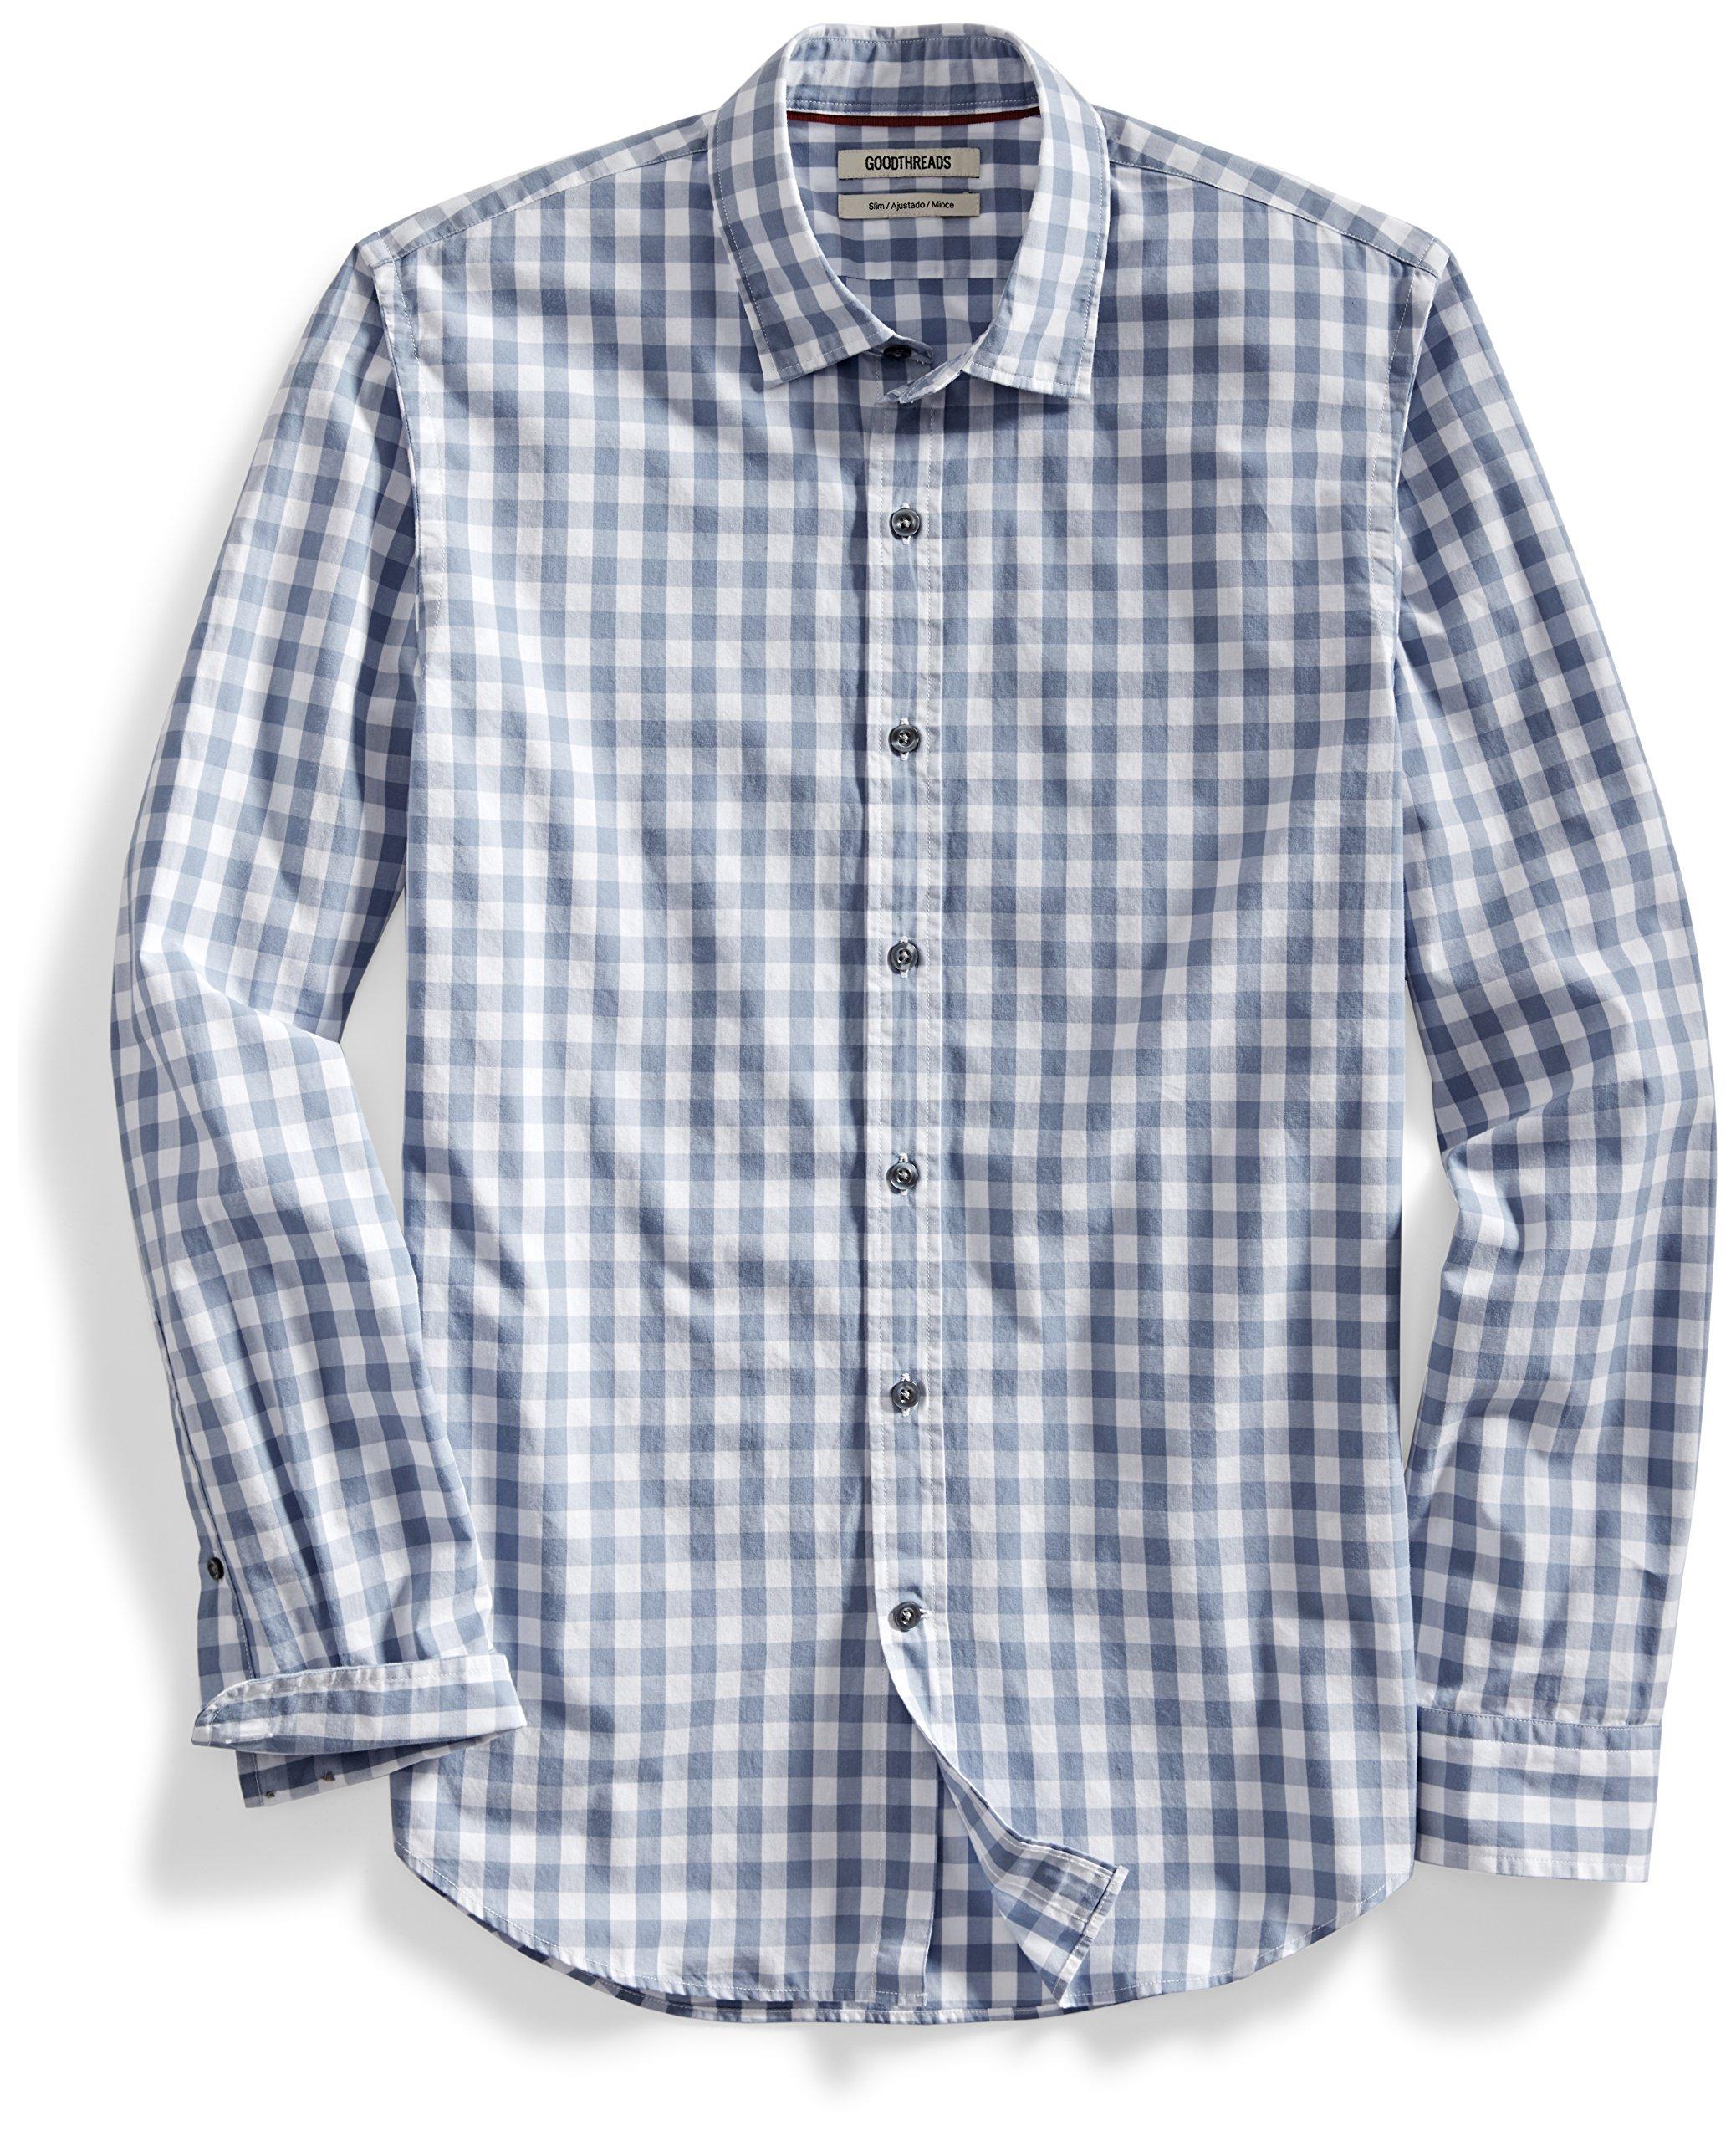 Goodthreads Men's Slim-Fit Long-Sleeve Gingham Plaid Poplin Shirt, Grey/White, Medium Tall